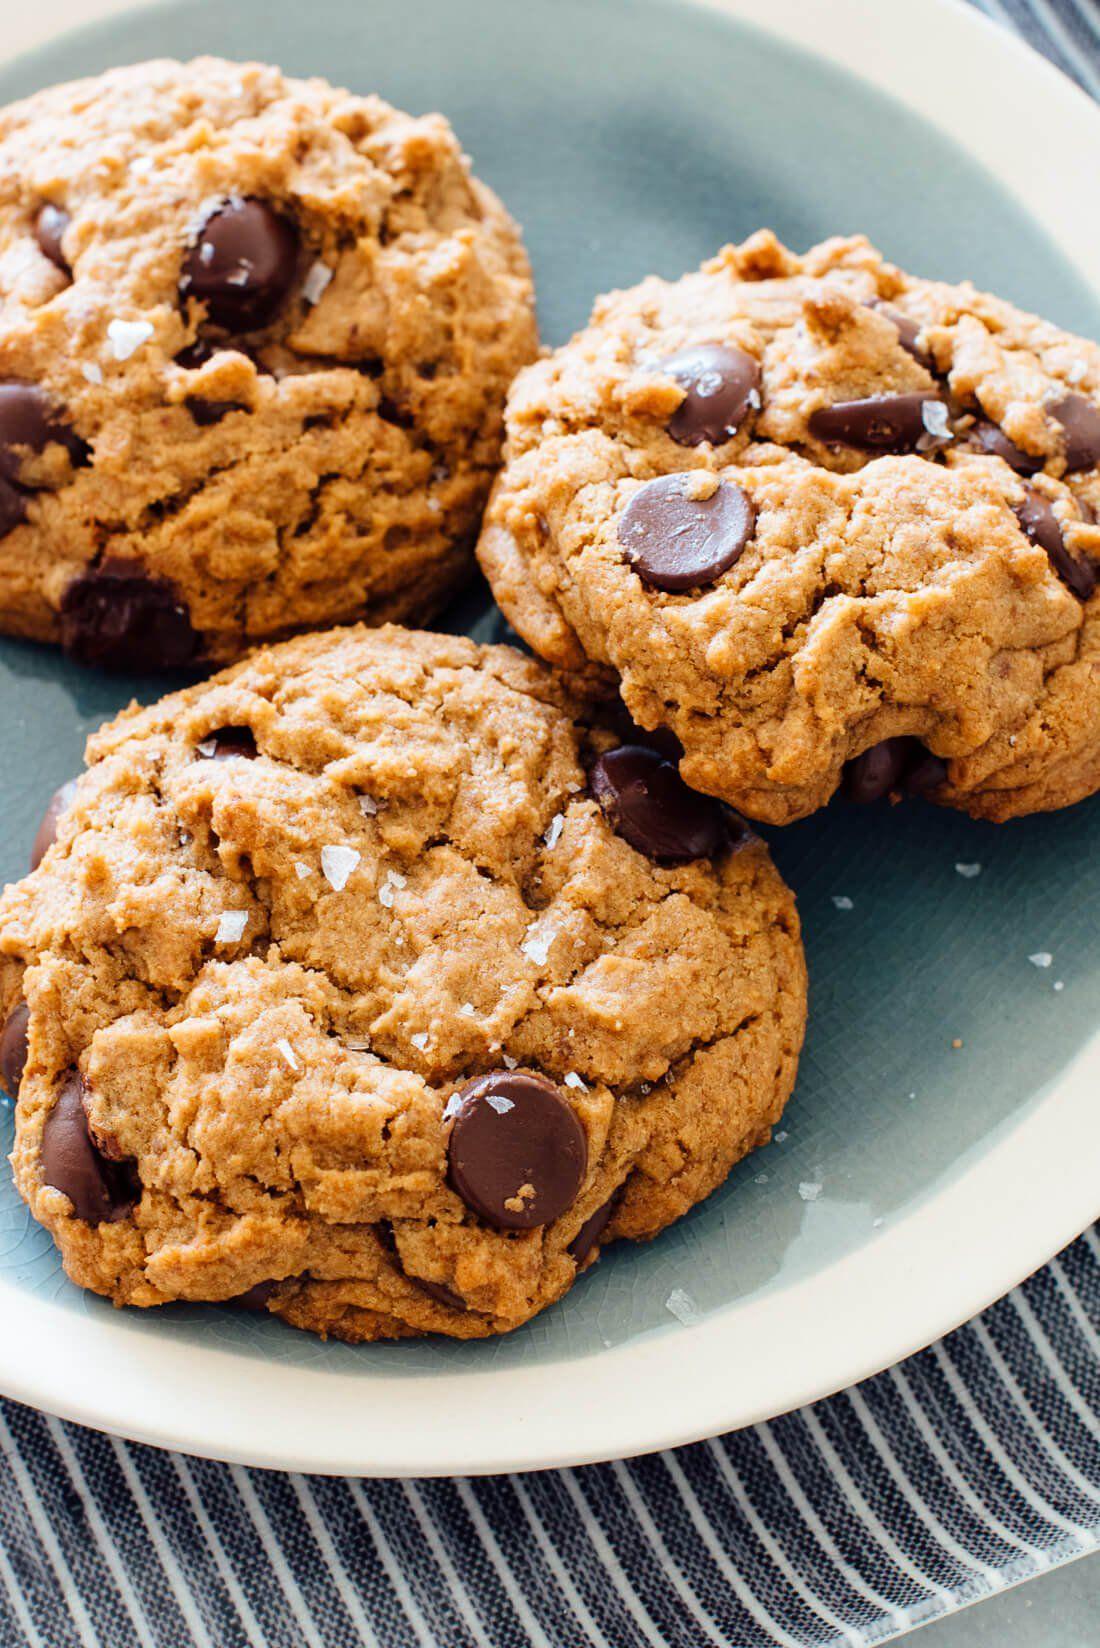 Amazing Chocolate Chip Cookies Recipe Vegan Cookie And Kate Recipe Chocolate Chip Cookies Cookies Recipes Chocolate Chip Vegan Chocolate Chip Cookies